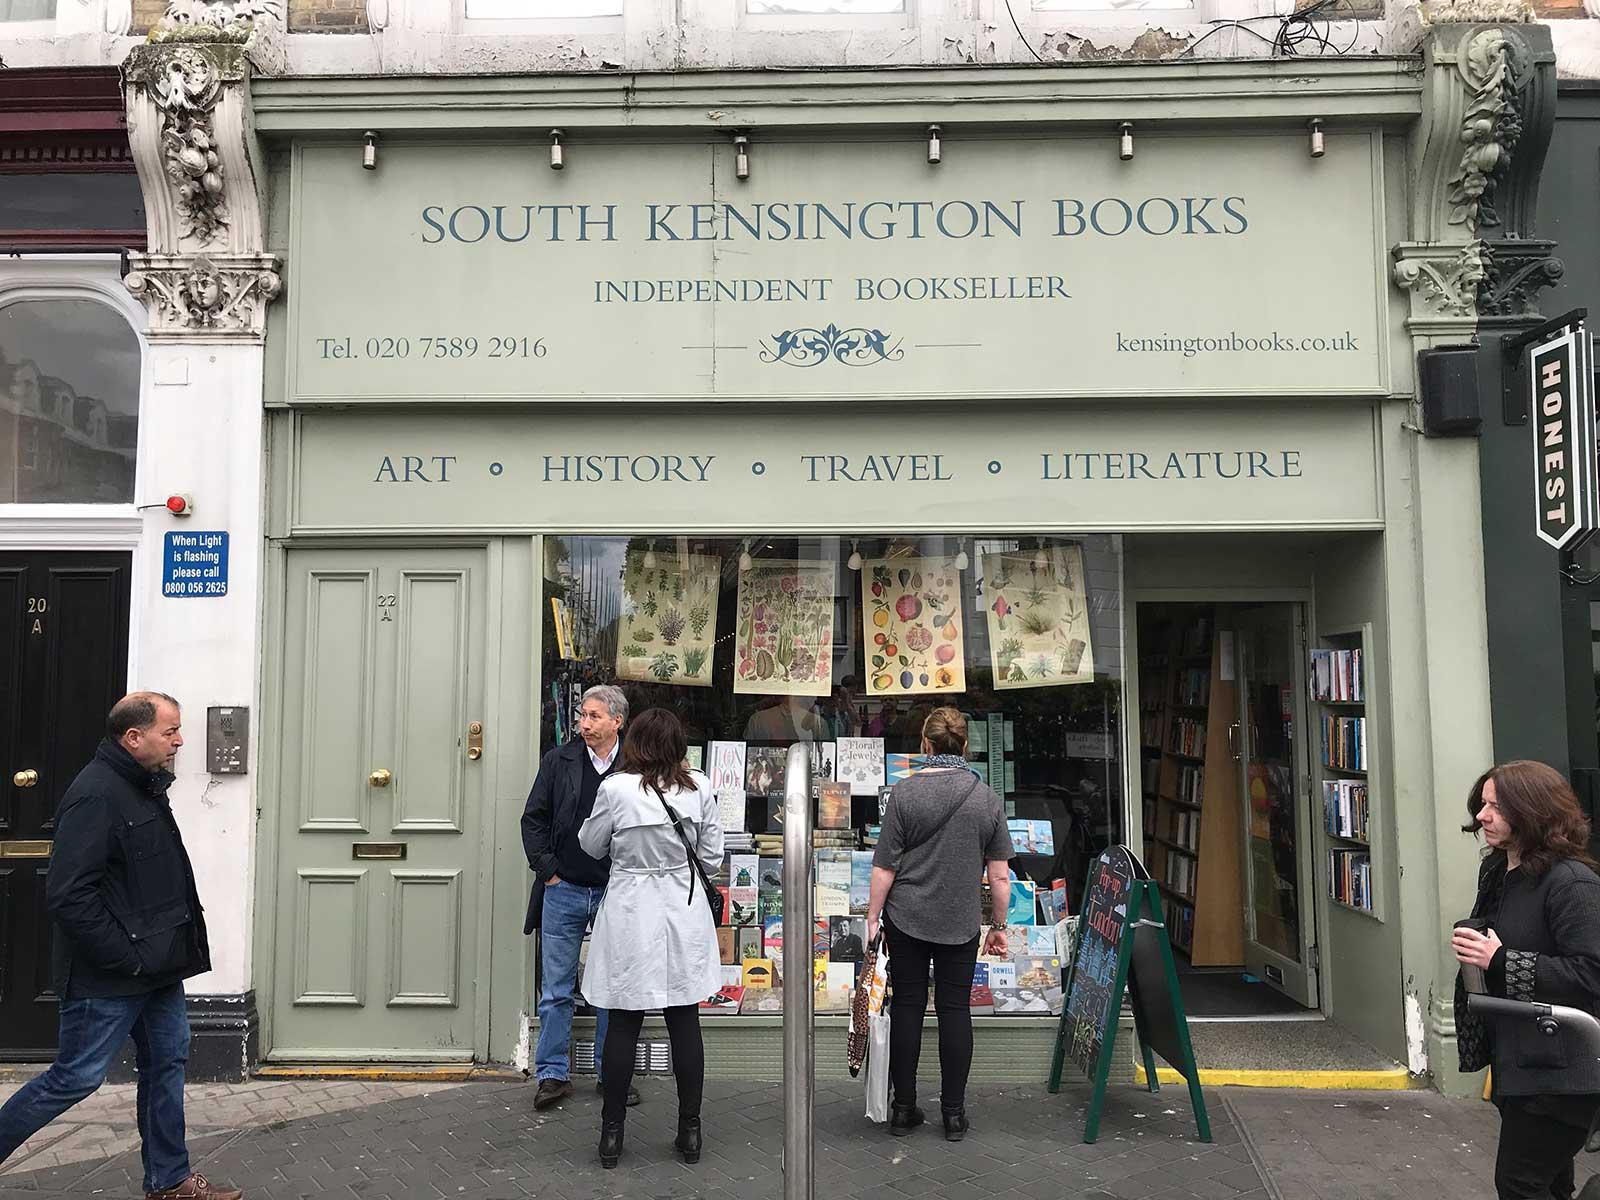 South Kensington Bookshop